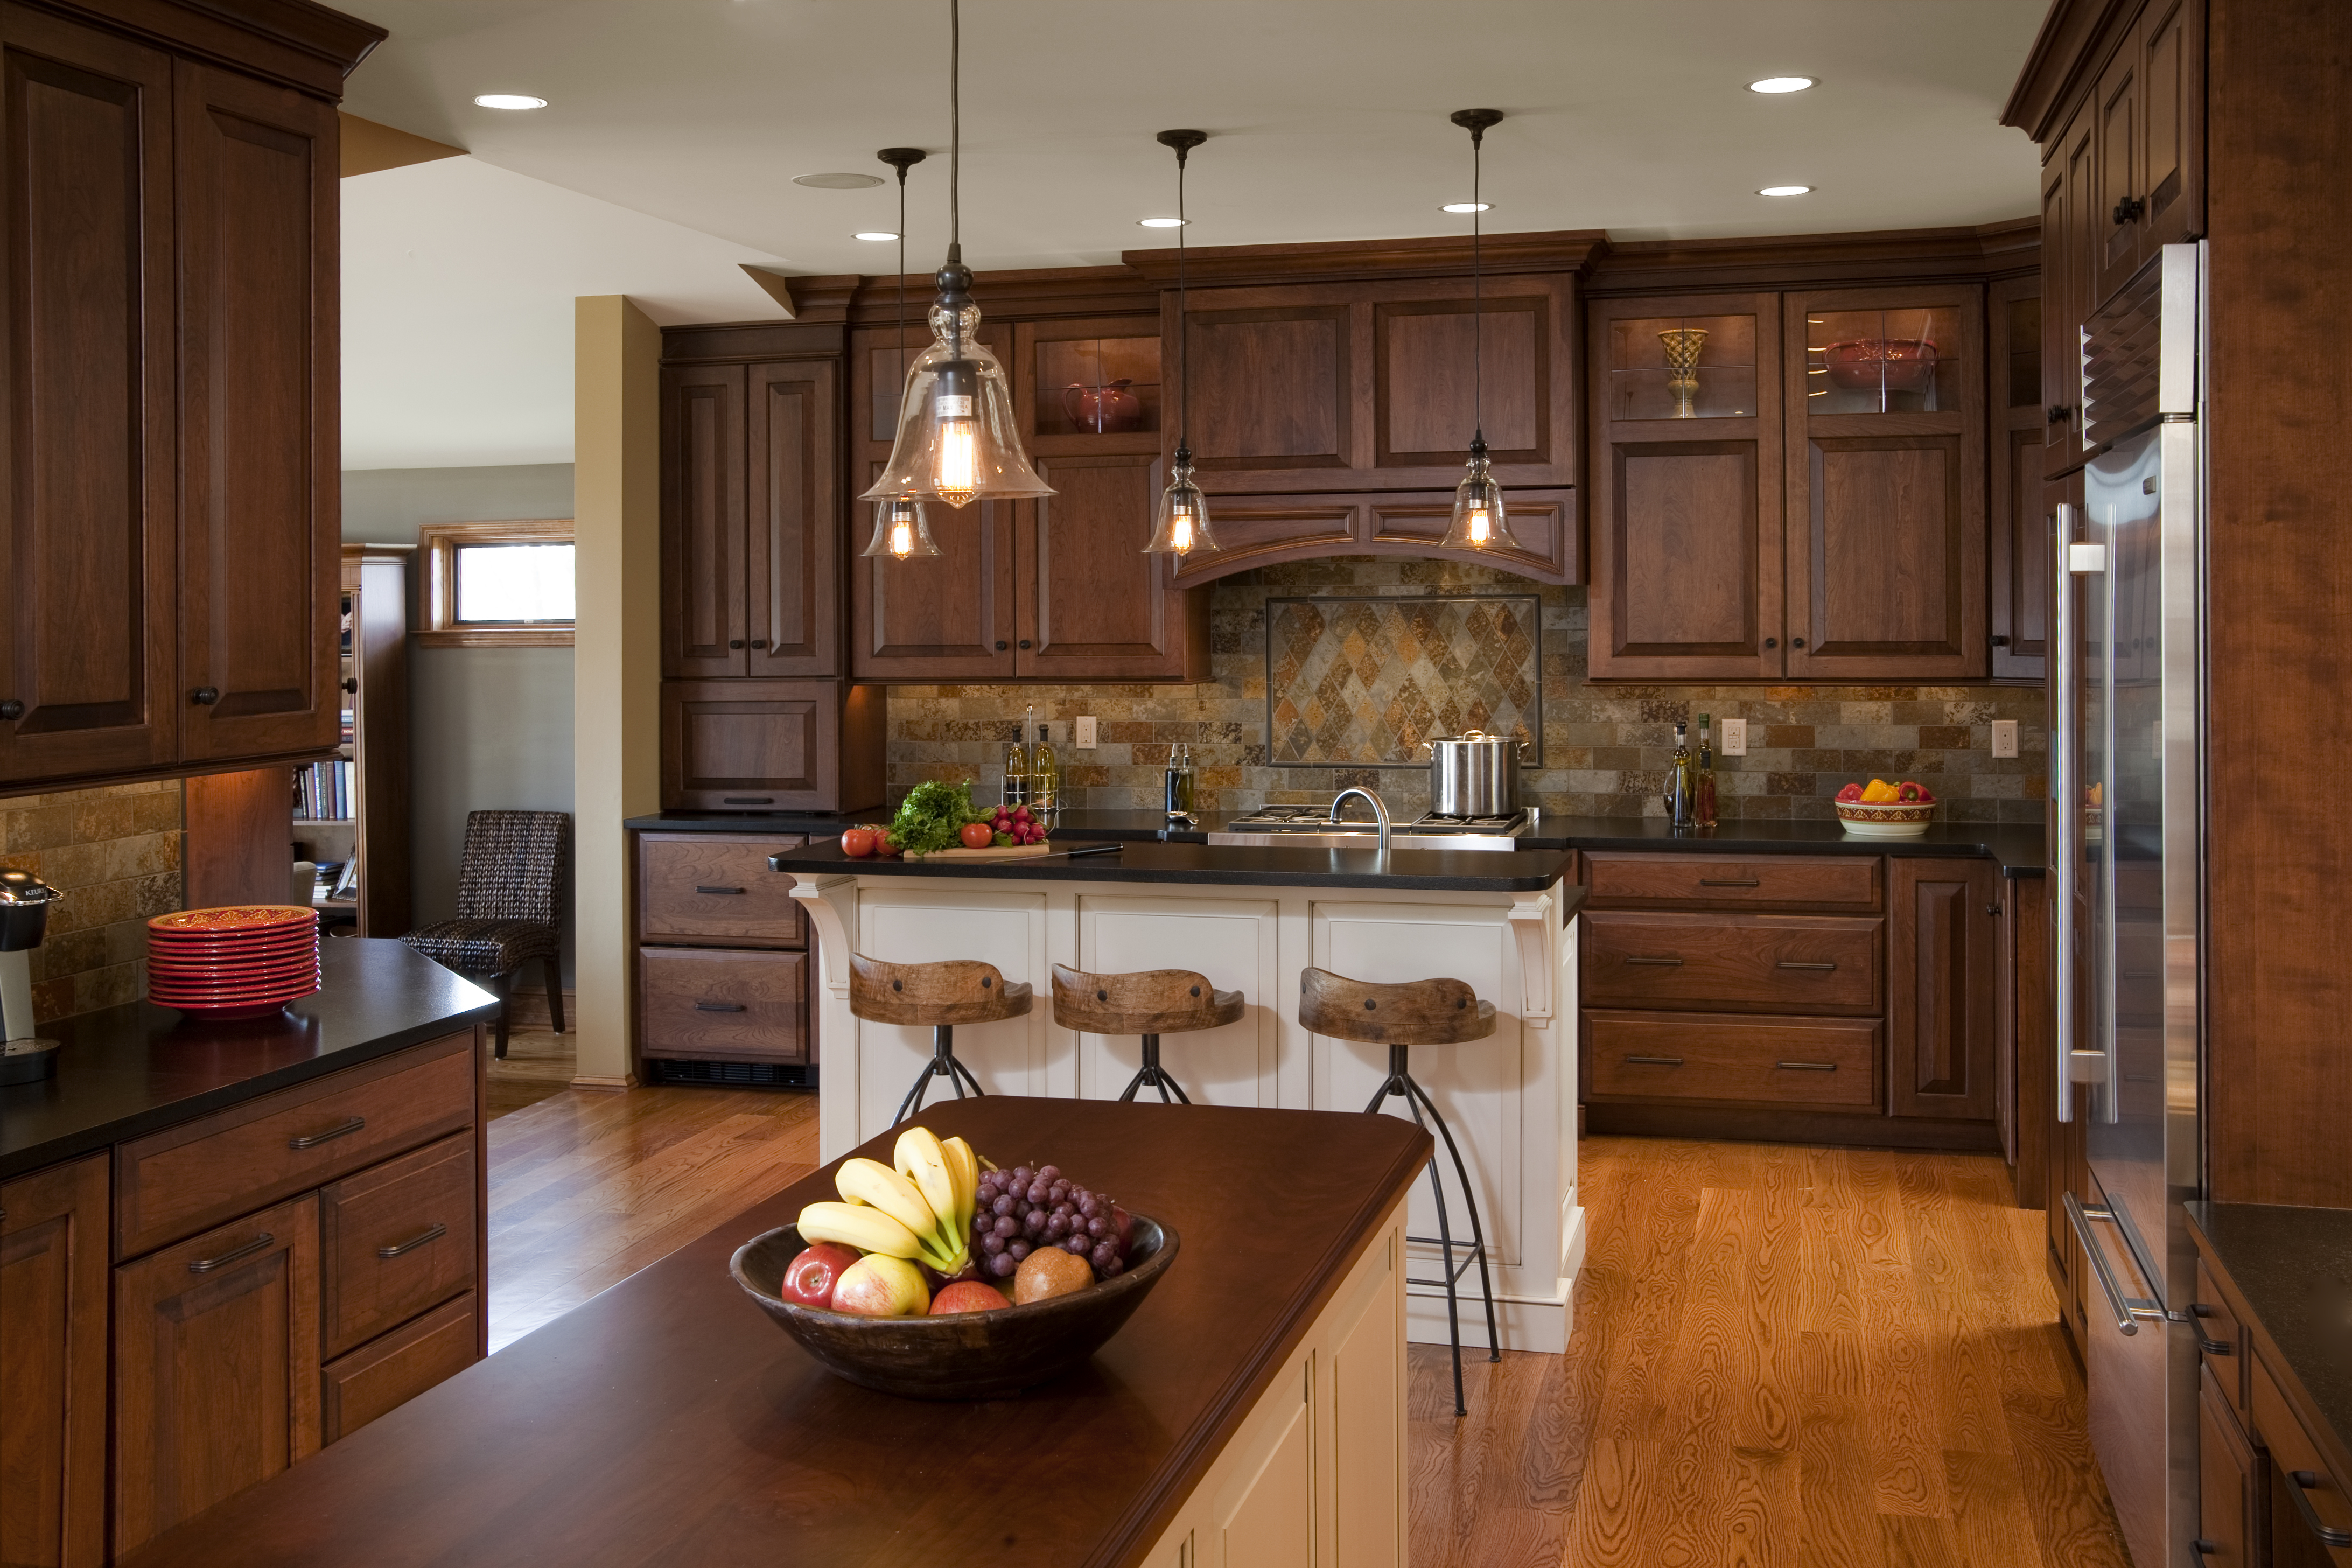 Minimalist Traditional Kitchen Designs With Simple Traditional Kitchen Designs And Decorating Gallery Ideas